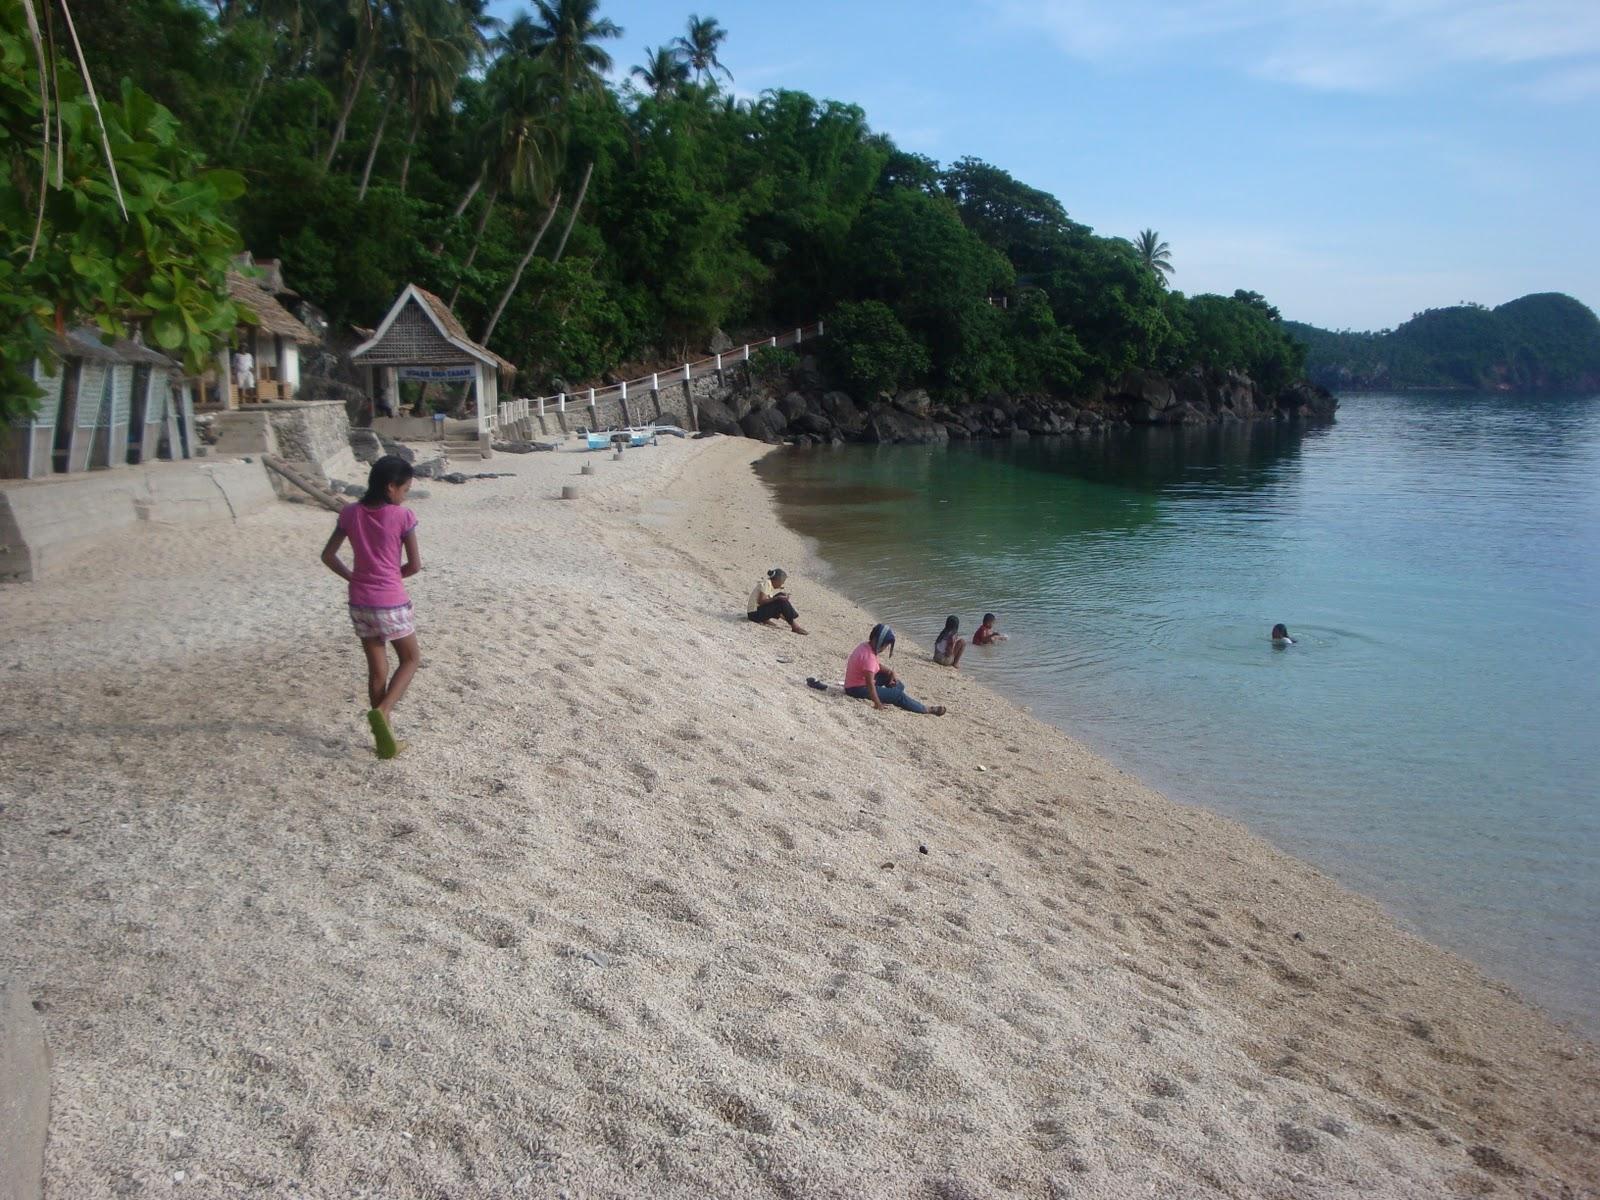 Barangay Mainit Beach, Macat-Ang Beach, Macat-ang